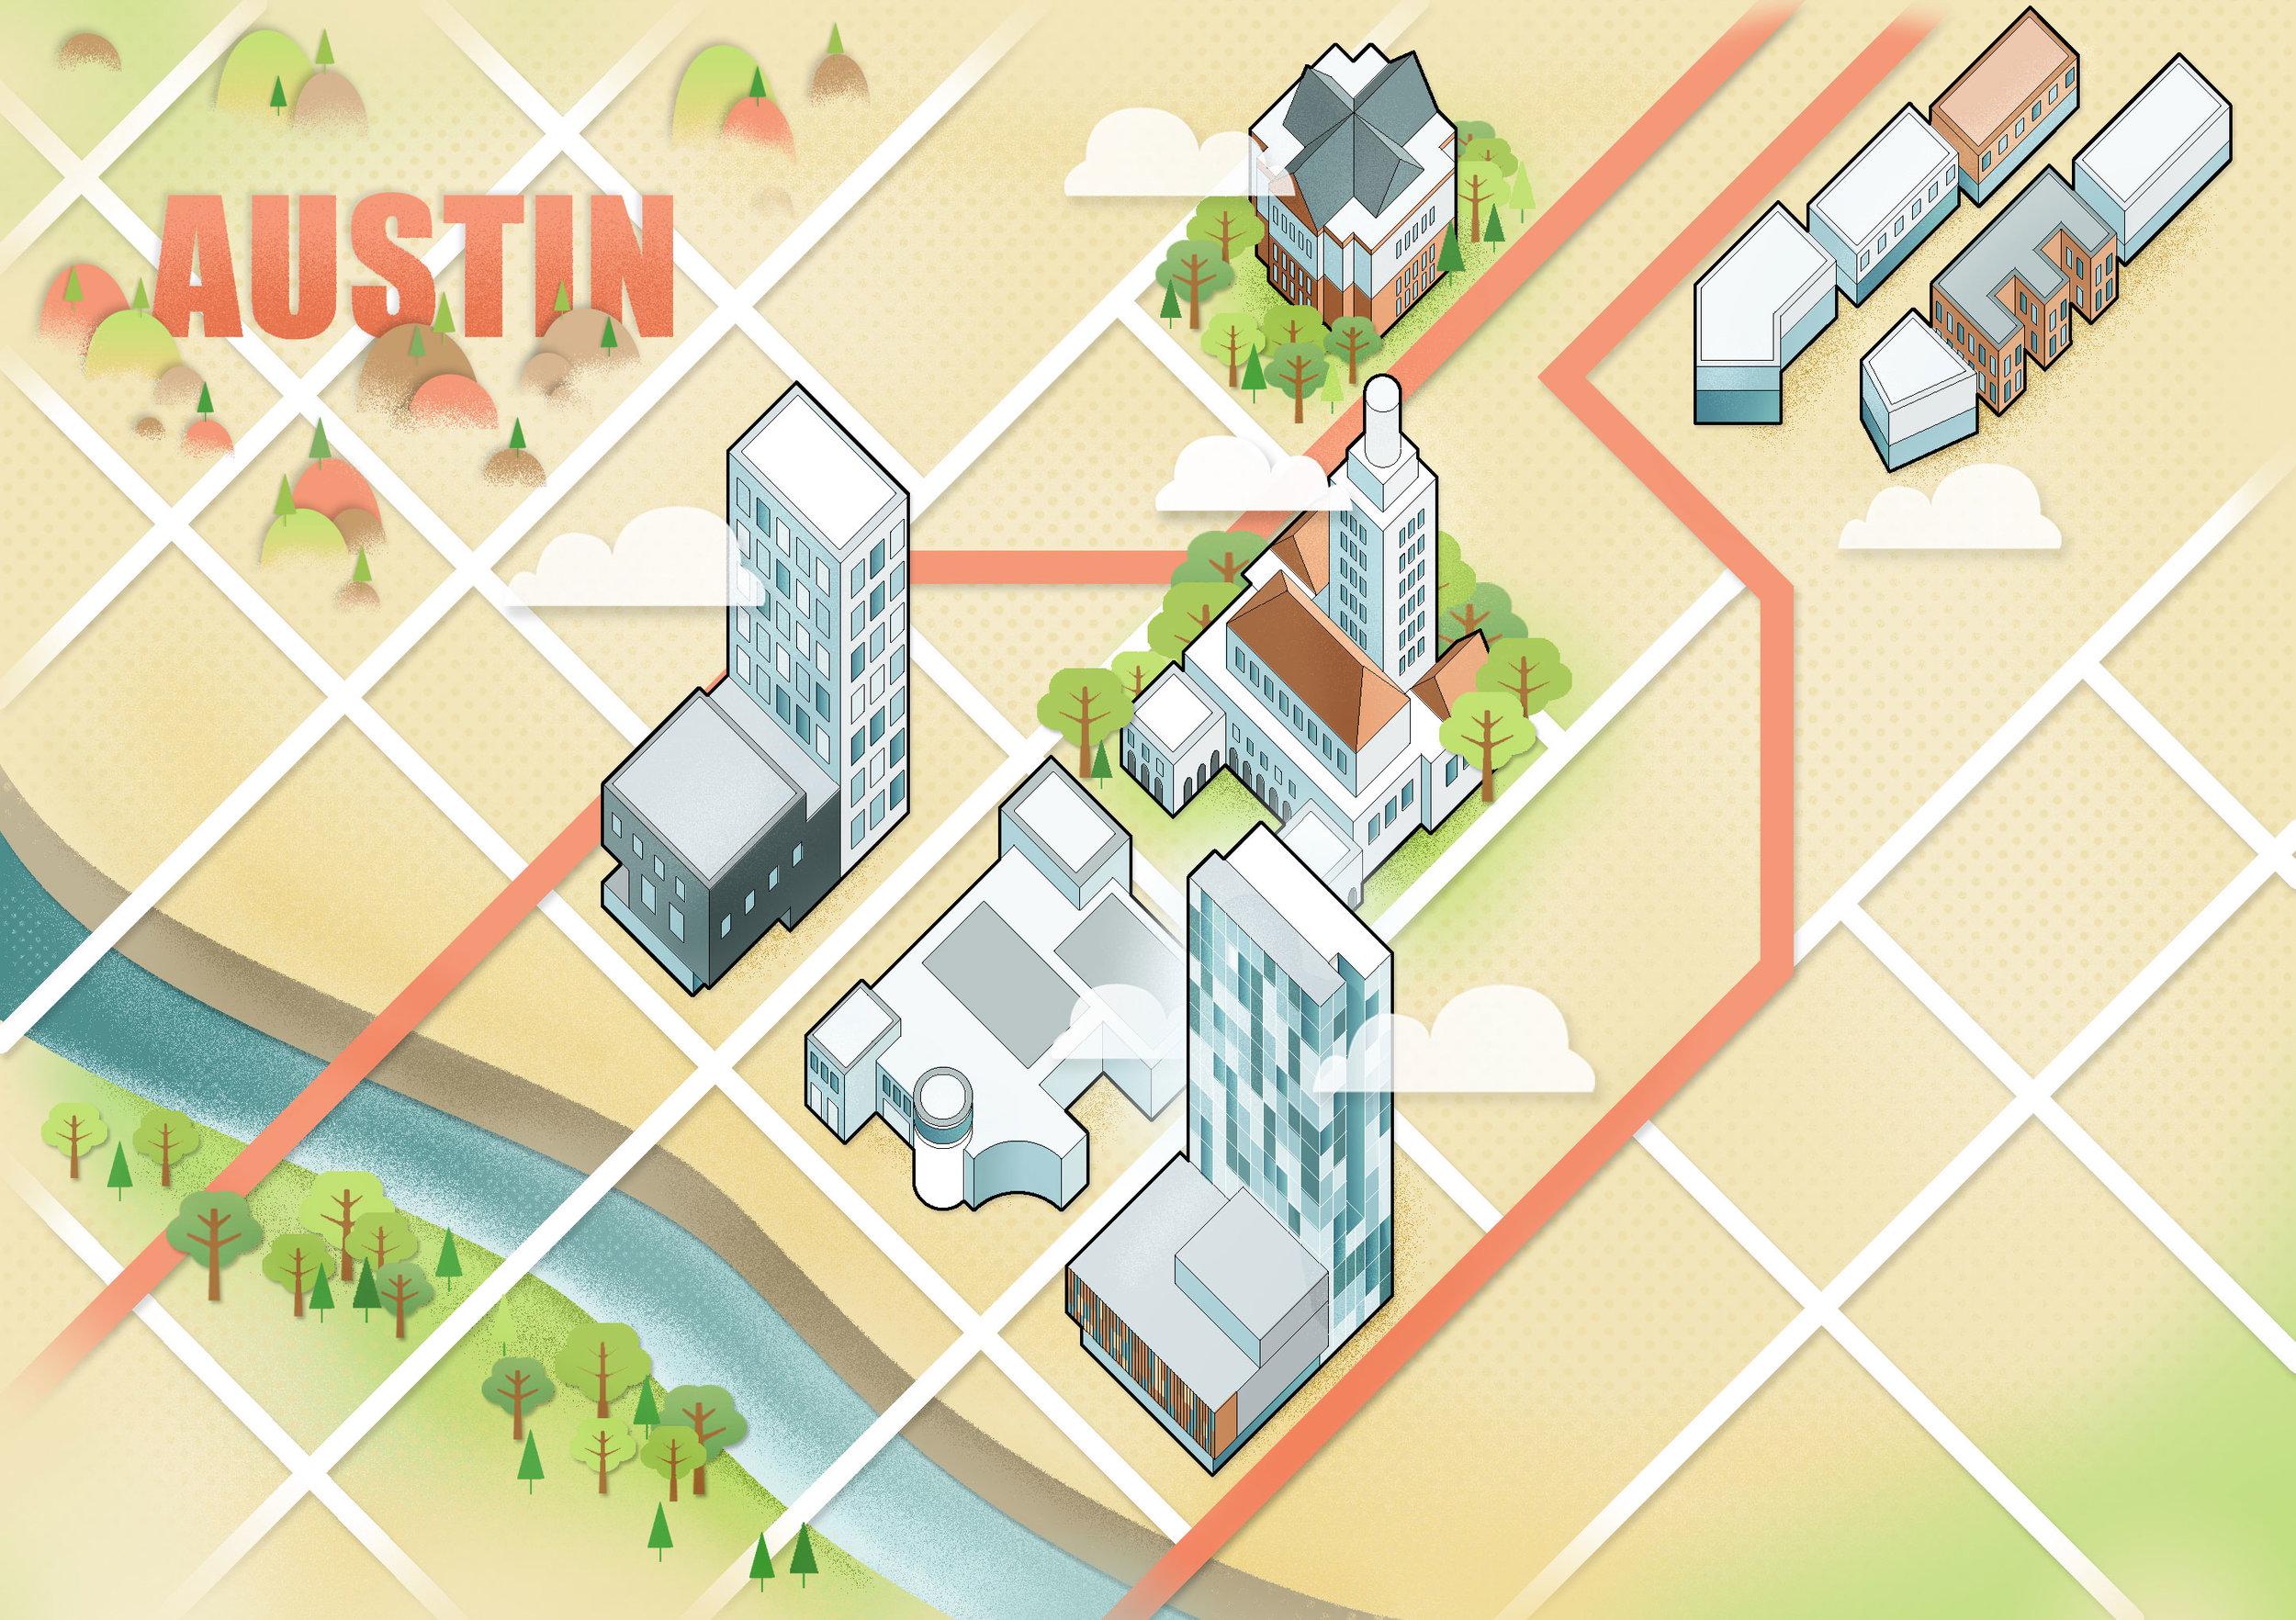 Reddin-Designs-Austin-map-detailed-designs_2.jpg